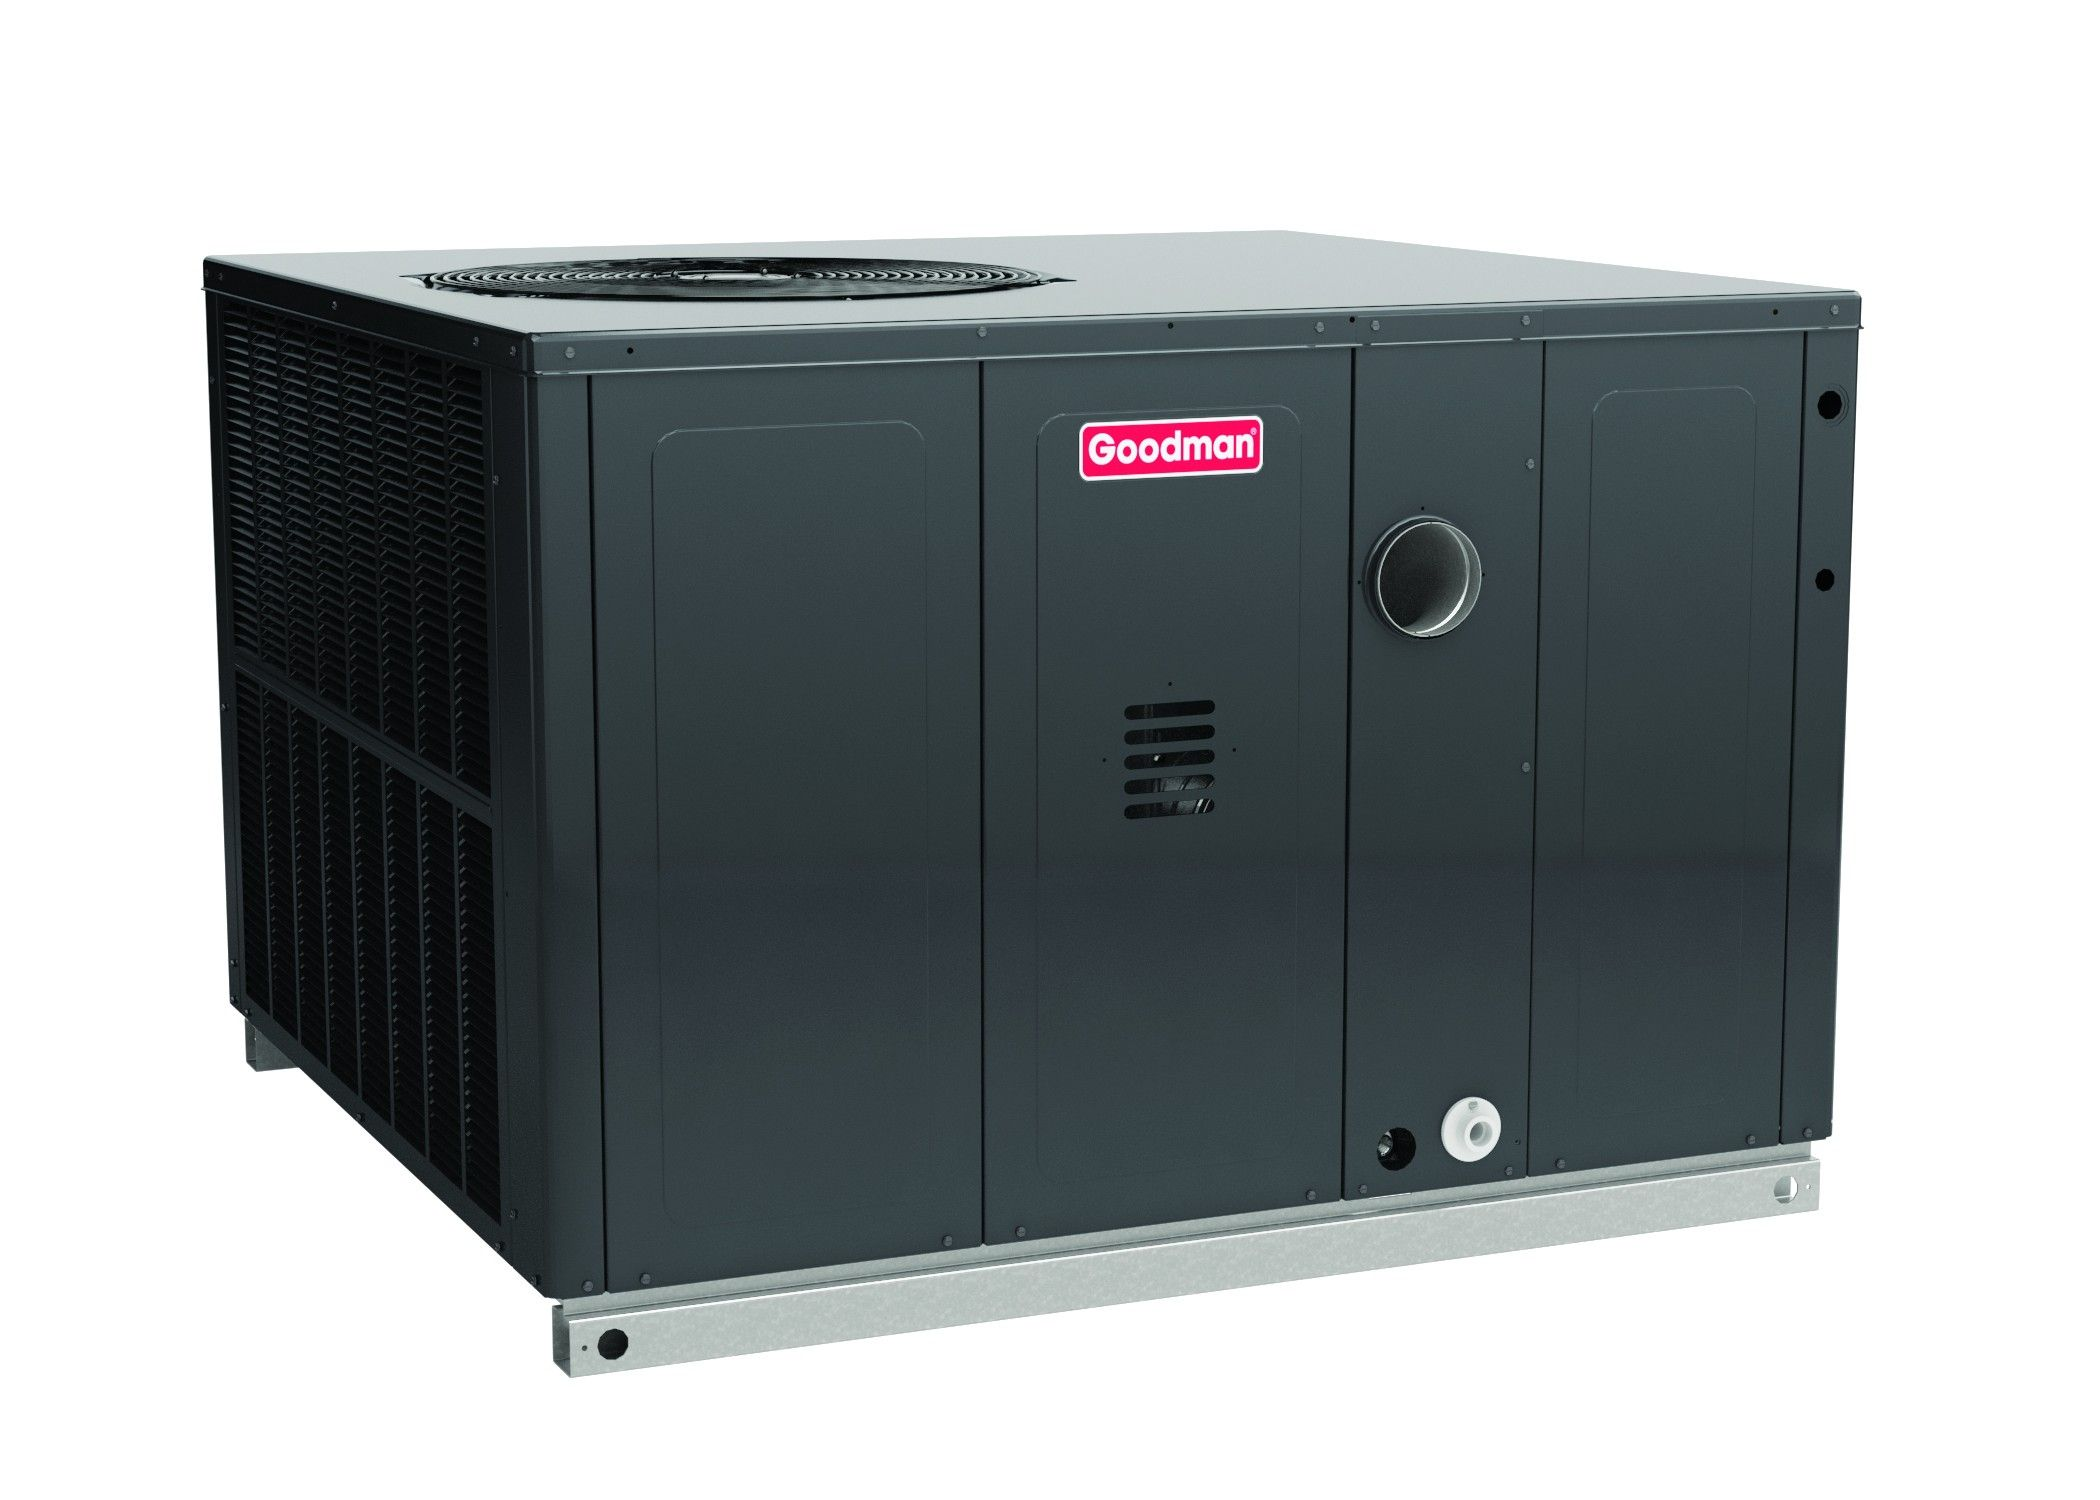 Goodman 2.0 Ton 14 SEER 40K BTU Packge Unit with Gas Heat - GPG1424040M41A